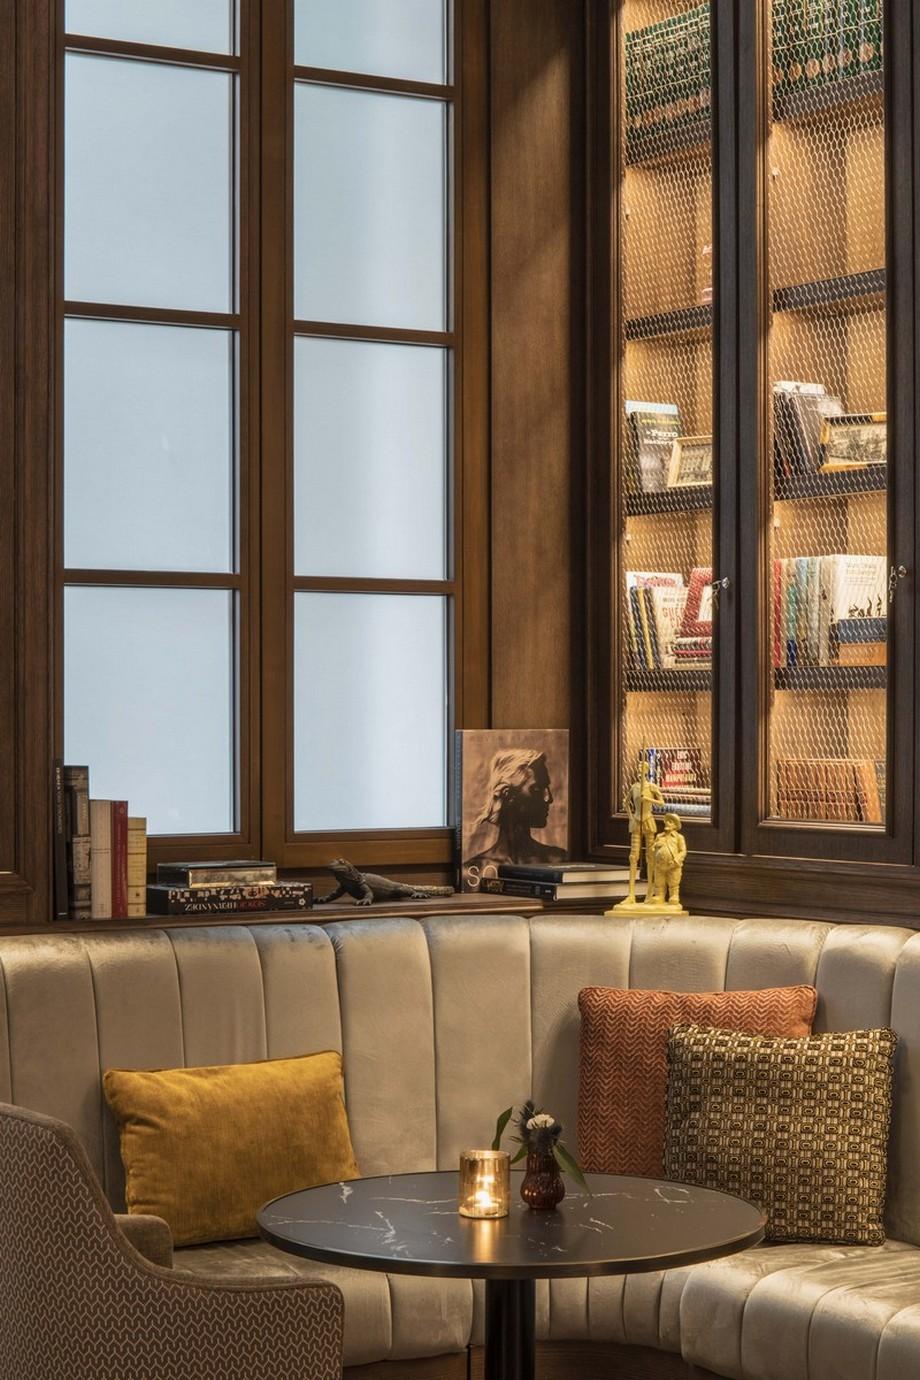 Hotel de Lujo: El Glamour en Madrid de un Hotel de los anõs 80 hotel de lujo Hotel de Lujo: El Glamour en Madrid de un Hotel de los anõs 80 Rockwell Group Revived the 1800s Glamour of Gran Hotel Ingl  s Madrid 6